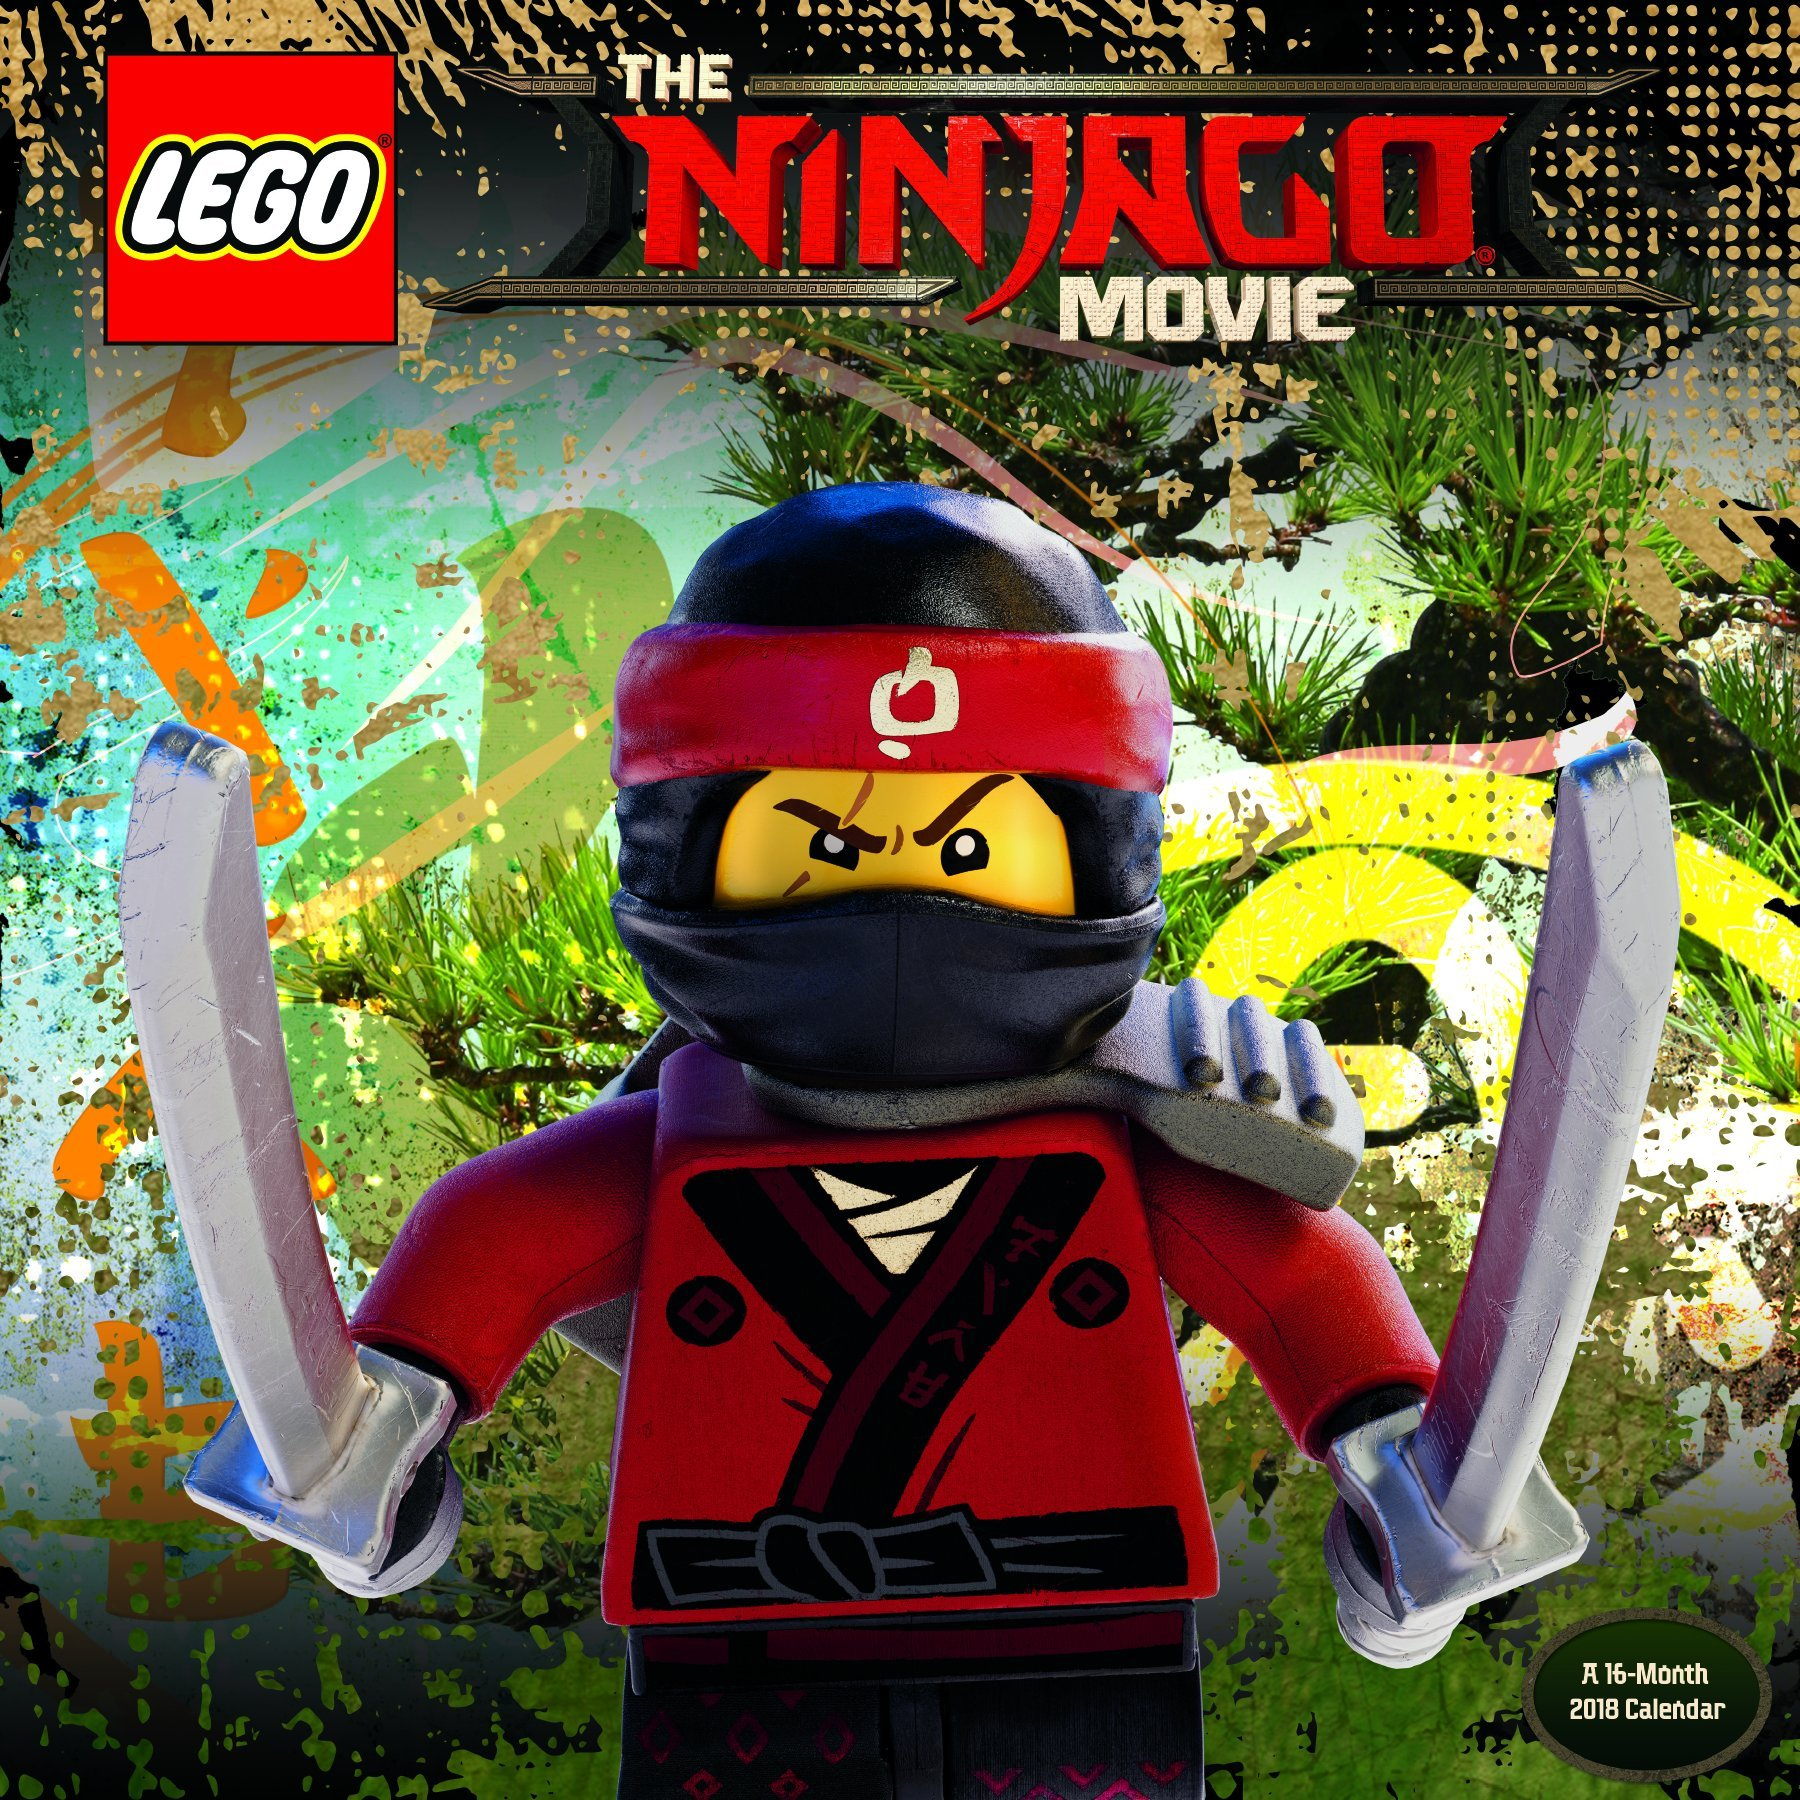 The Lego Ninjago Movie 2018 Calendar